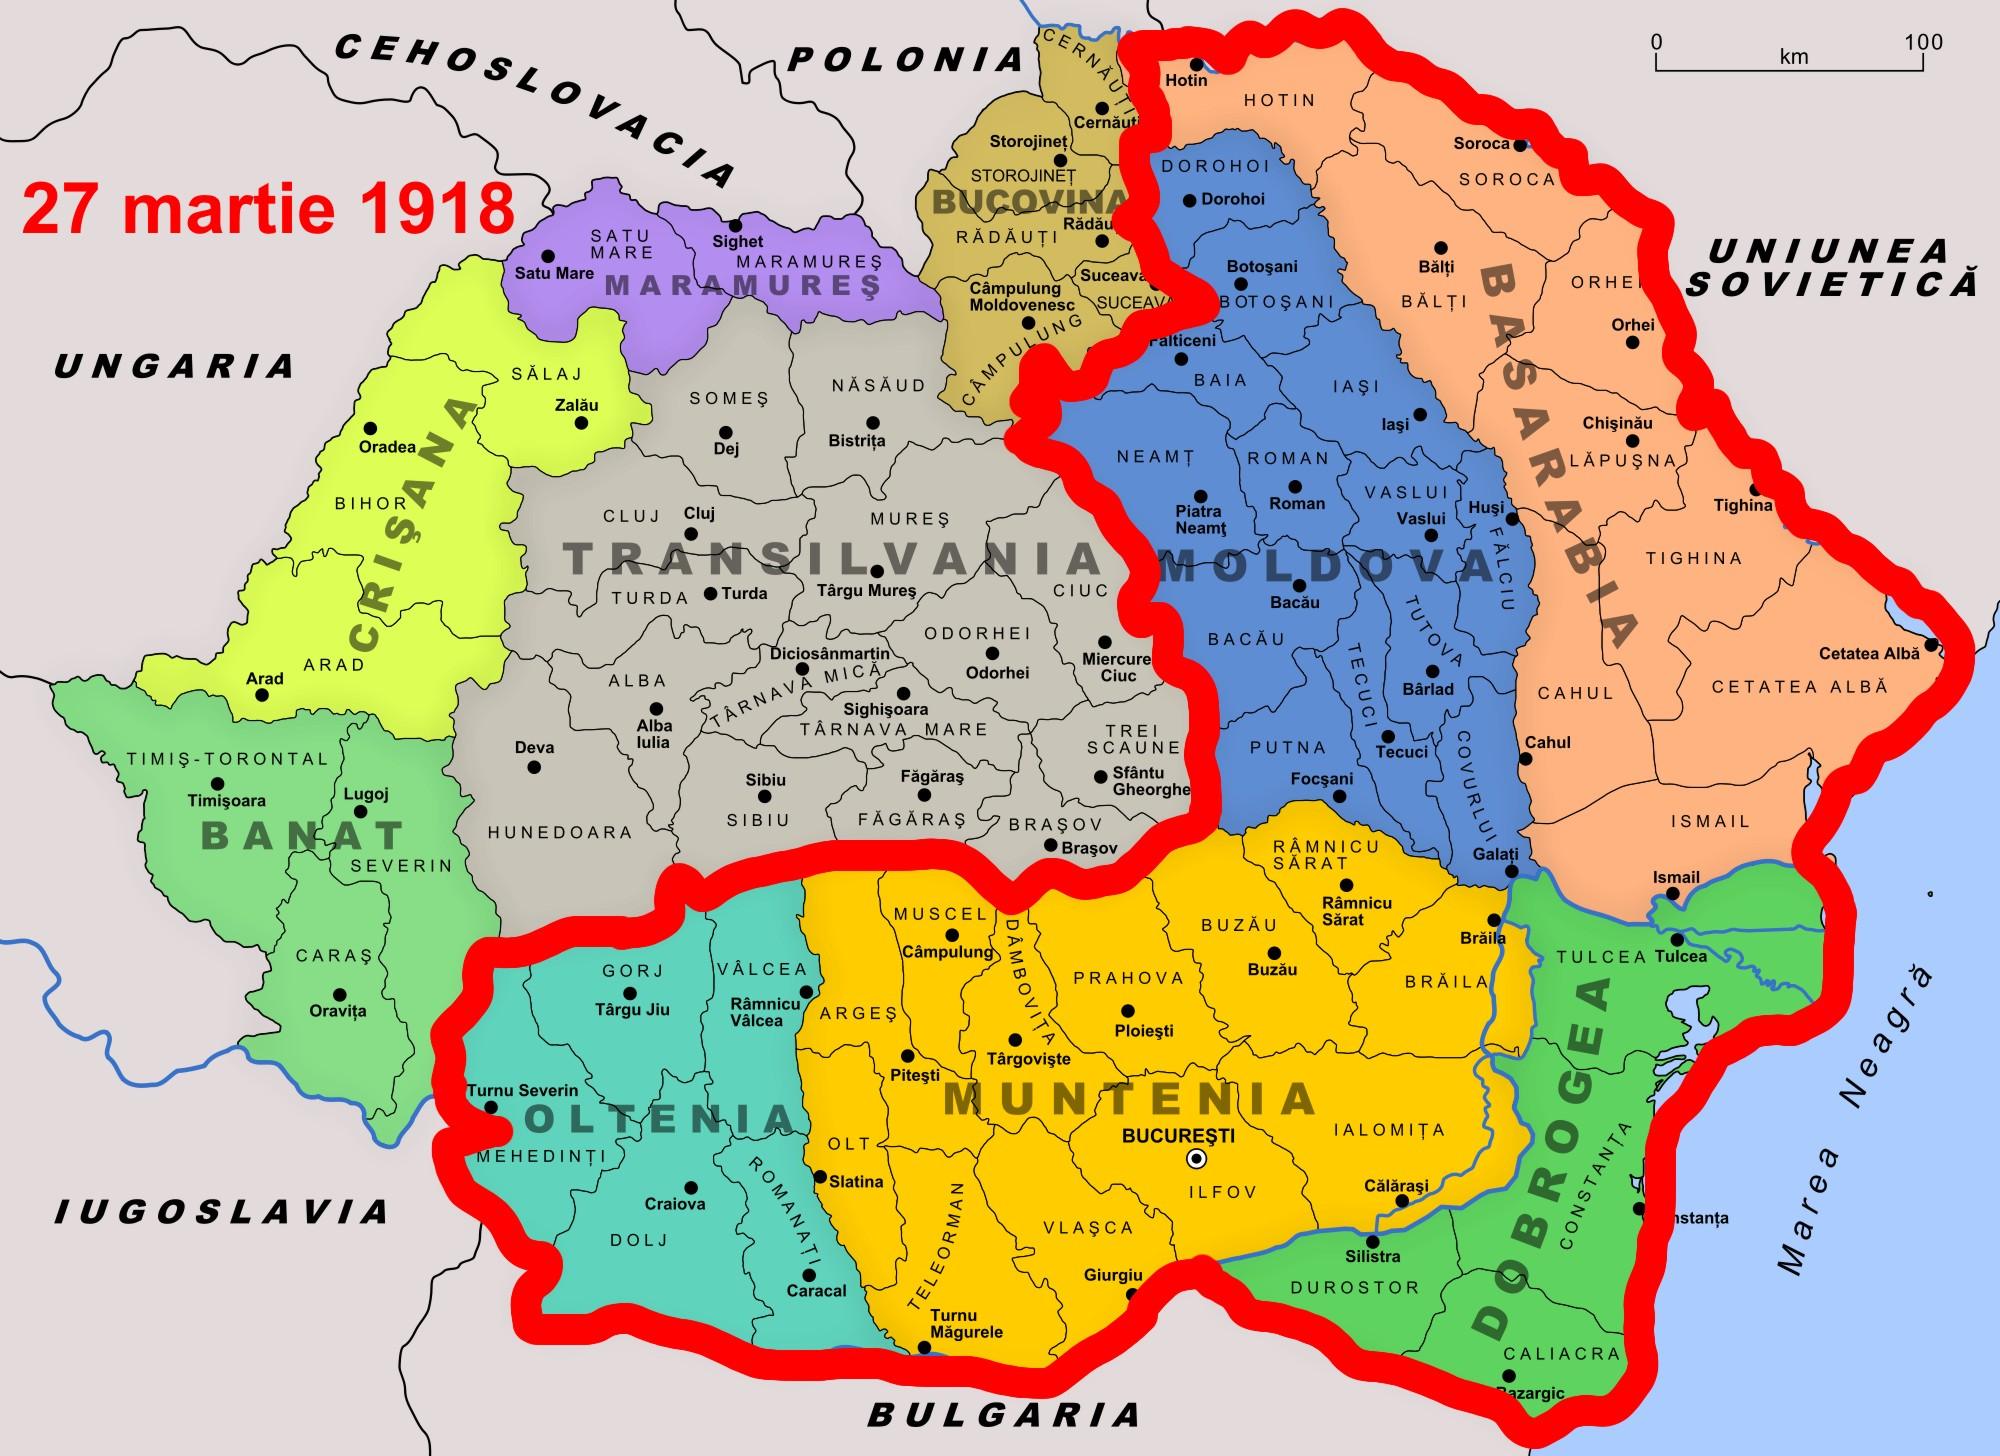 Harta Romaniei Romania Cu Basarabia1 7est Ro Stiri Iasi Stiri